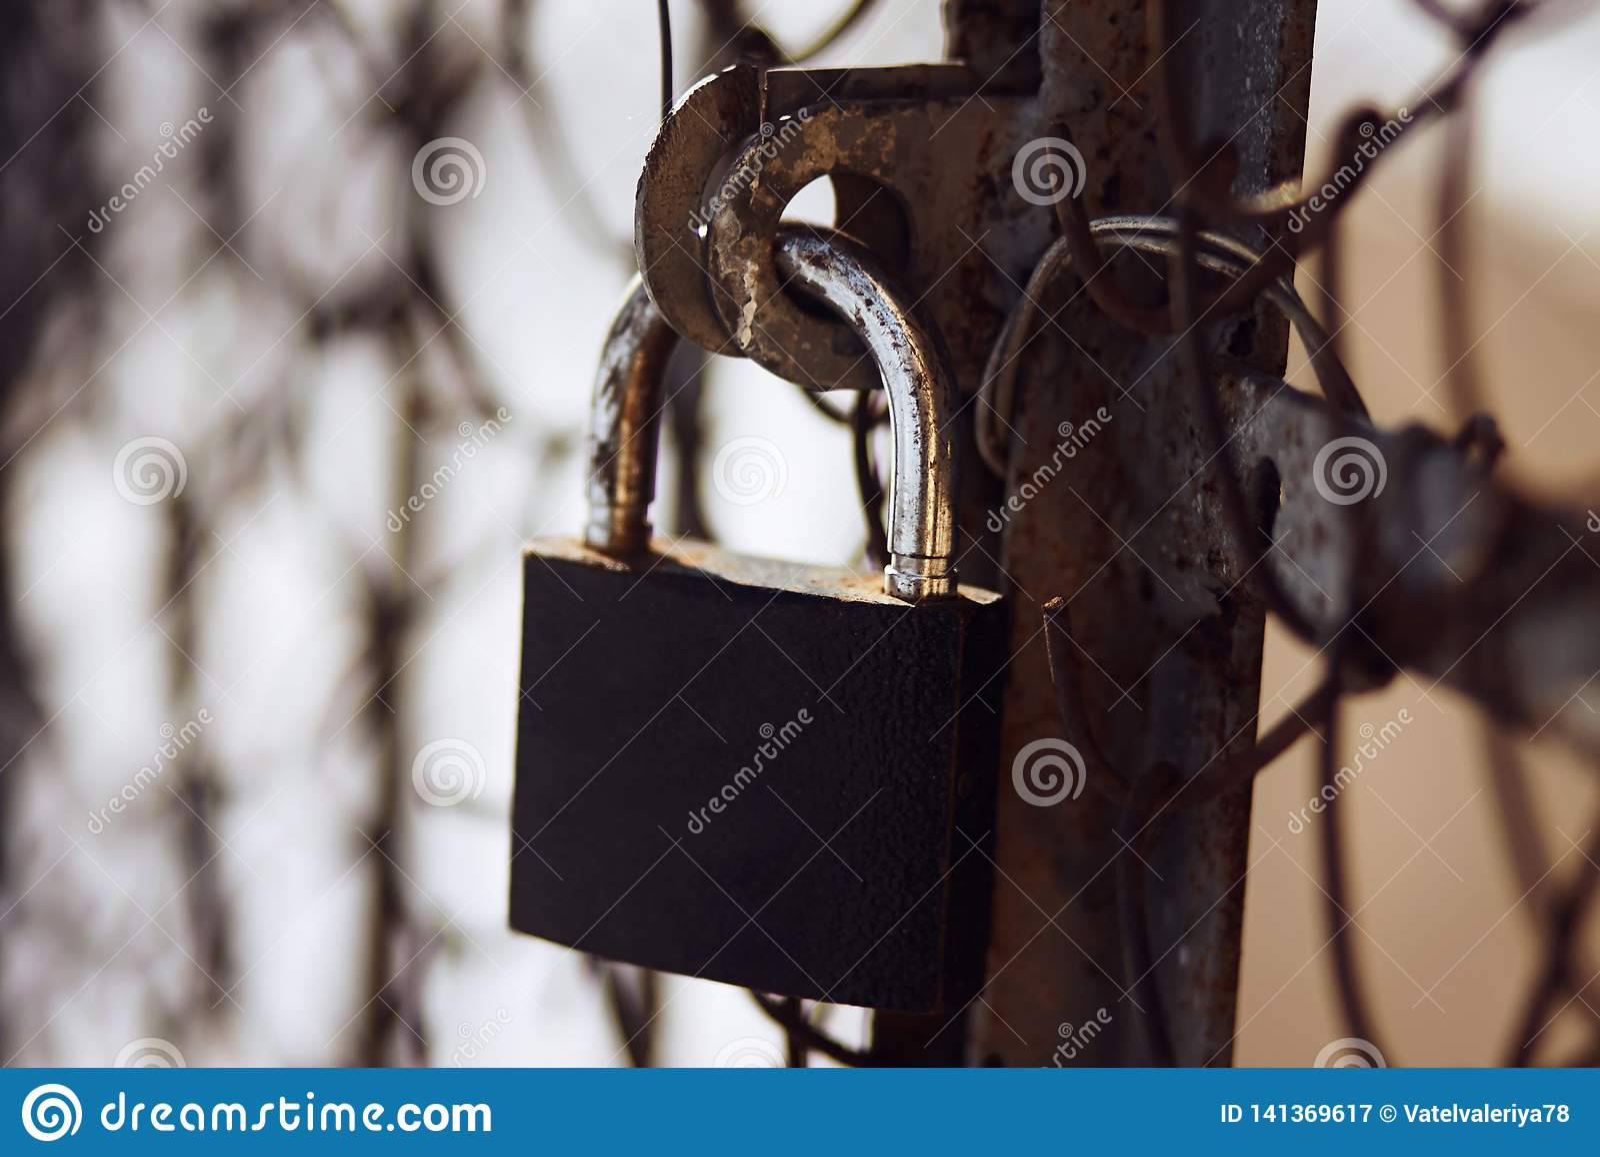 Het roestige sjofele slot sluit de roestige oude poort